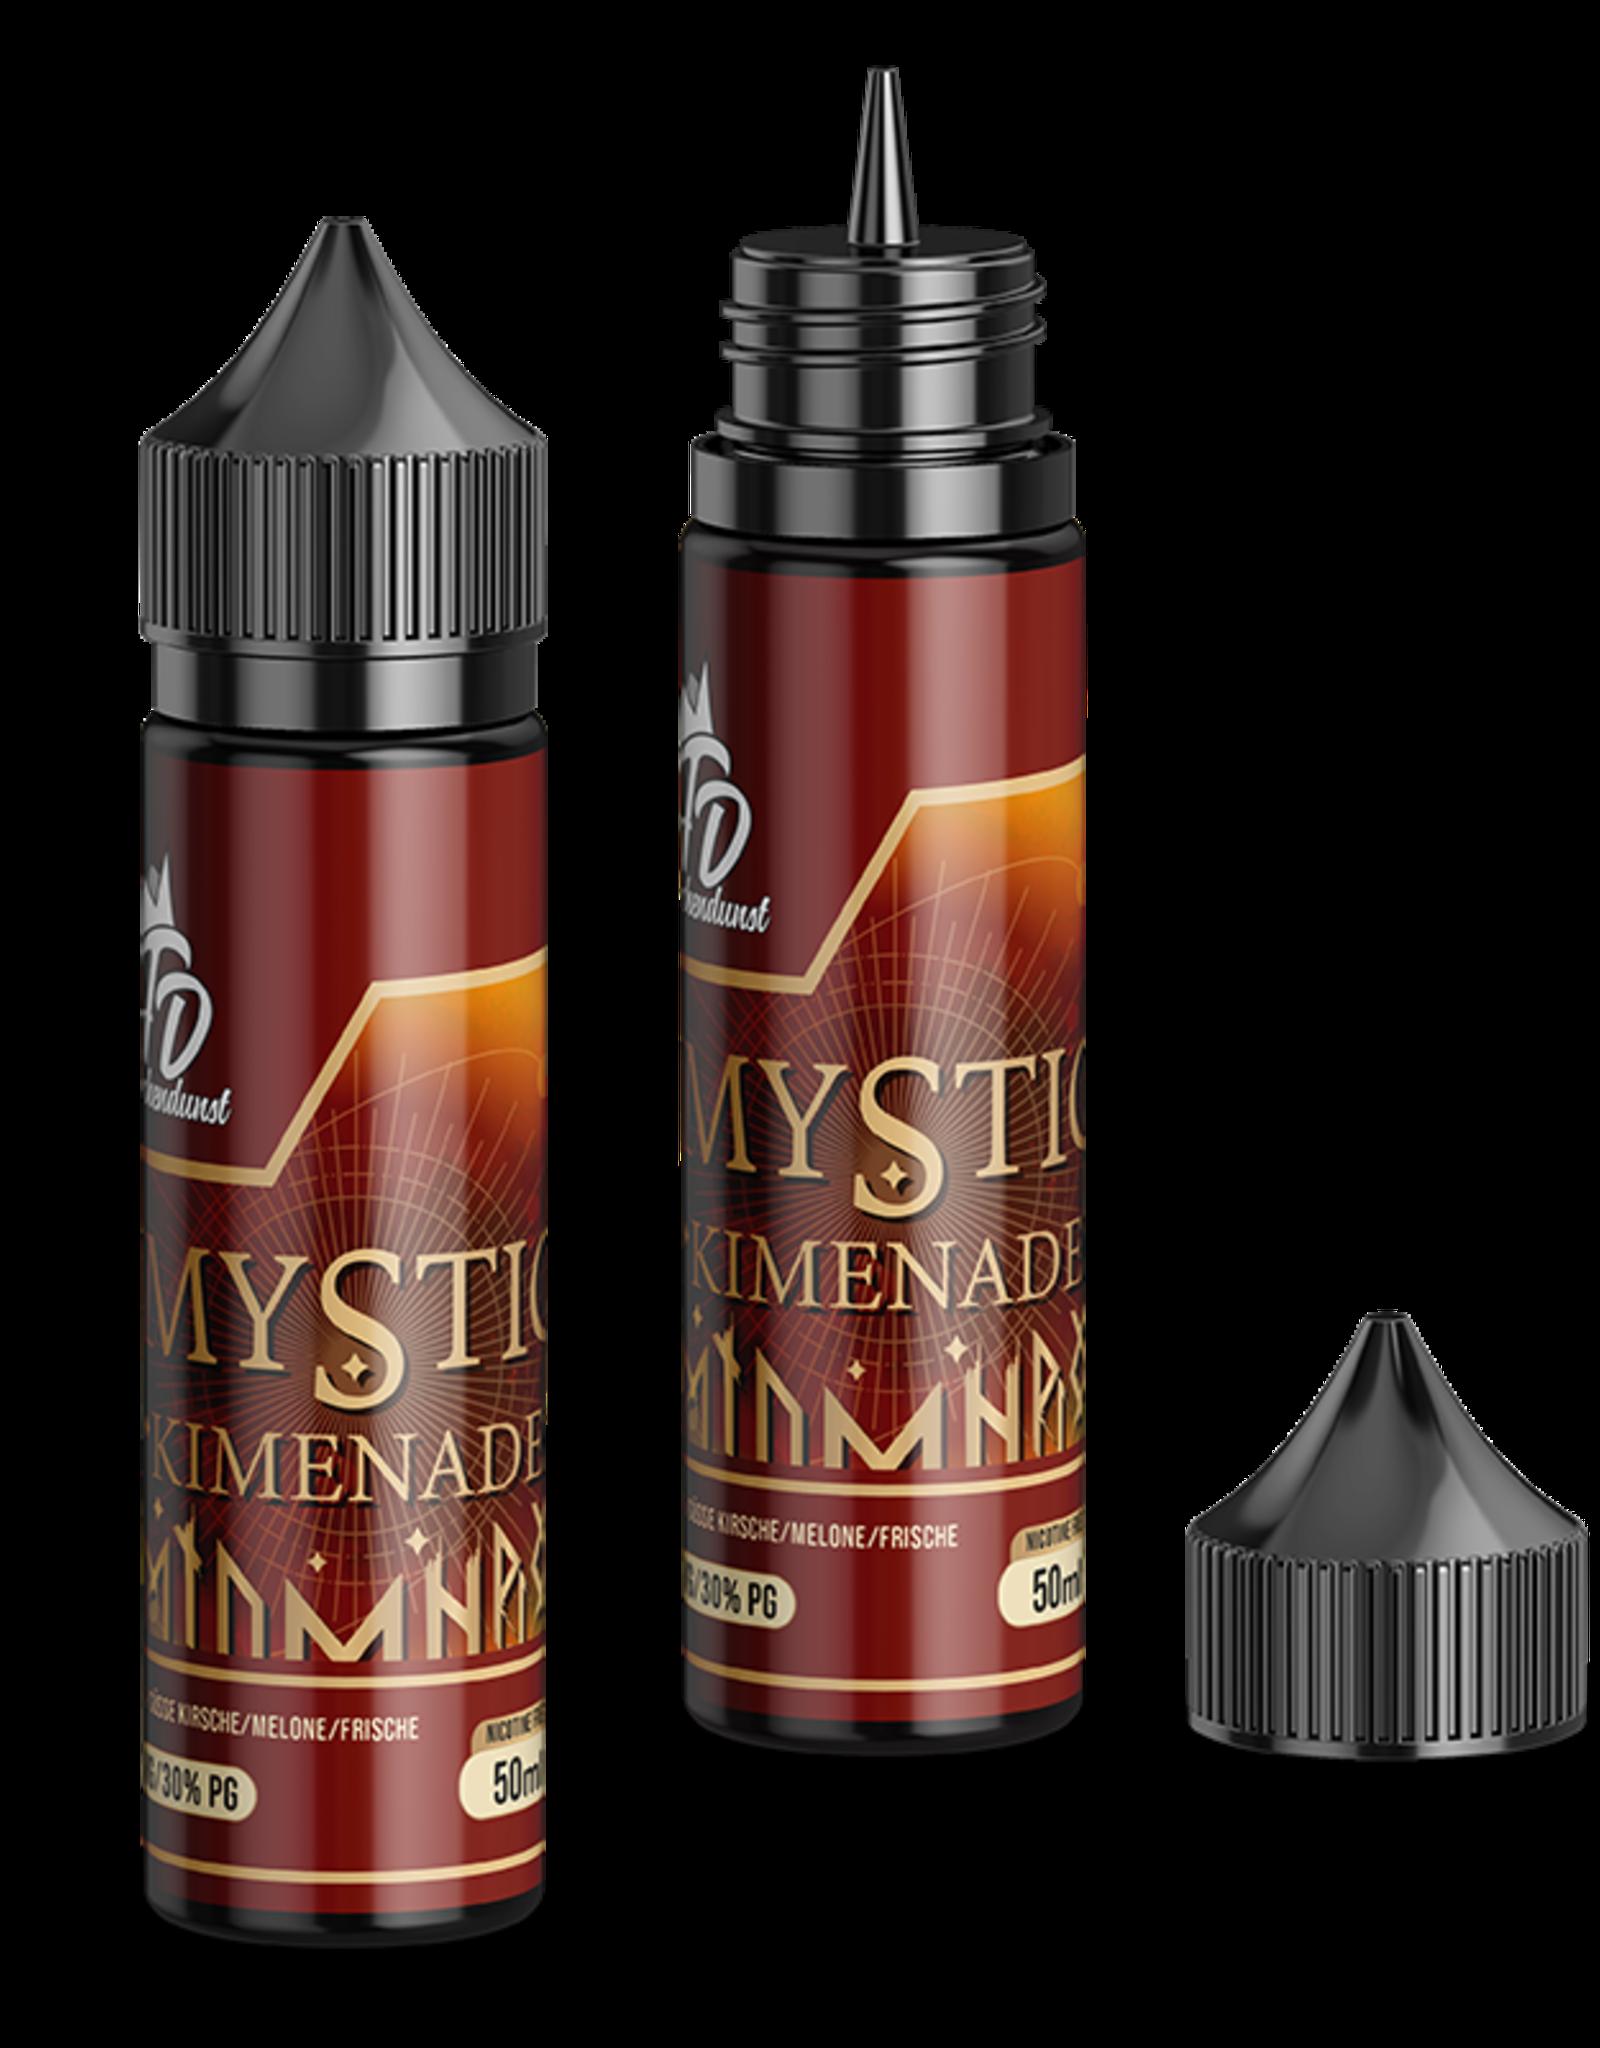 Flaschendunst Flaschendunst - Mystic Kimenade 50ml